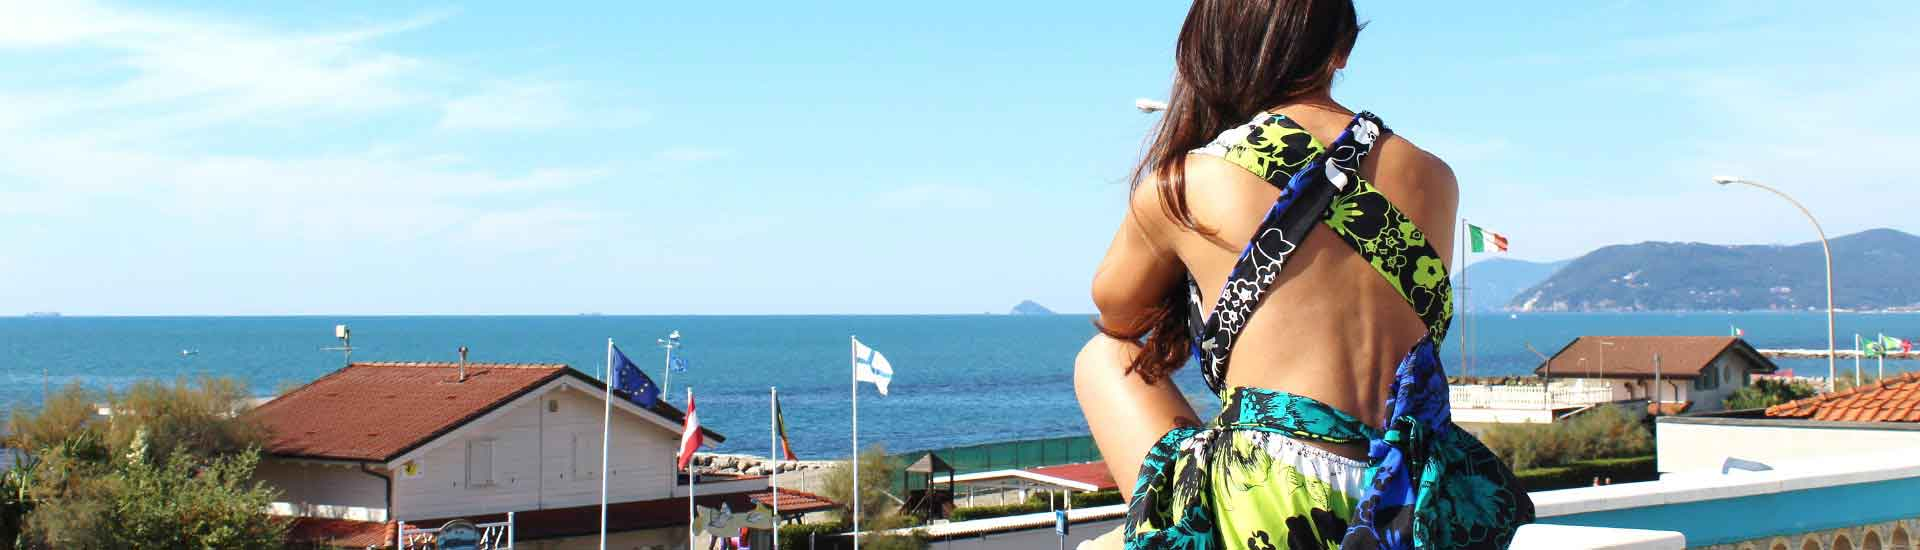 Vacances été - Hotel Eco del Mare